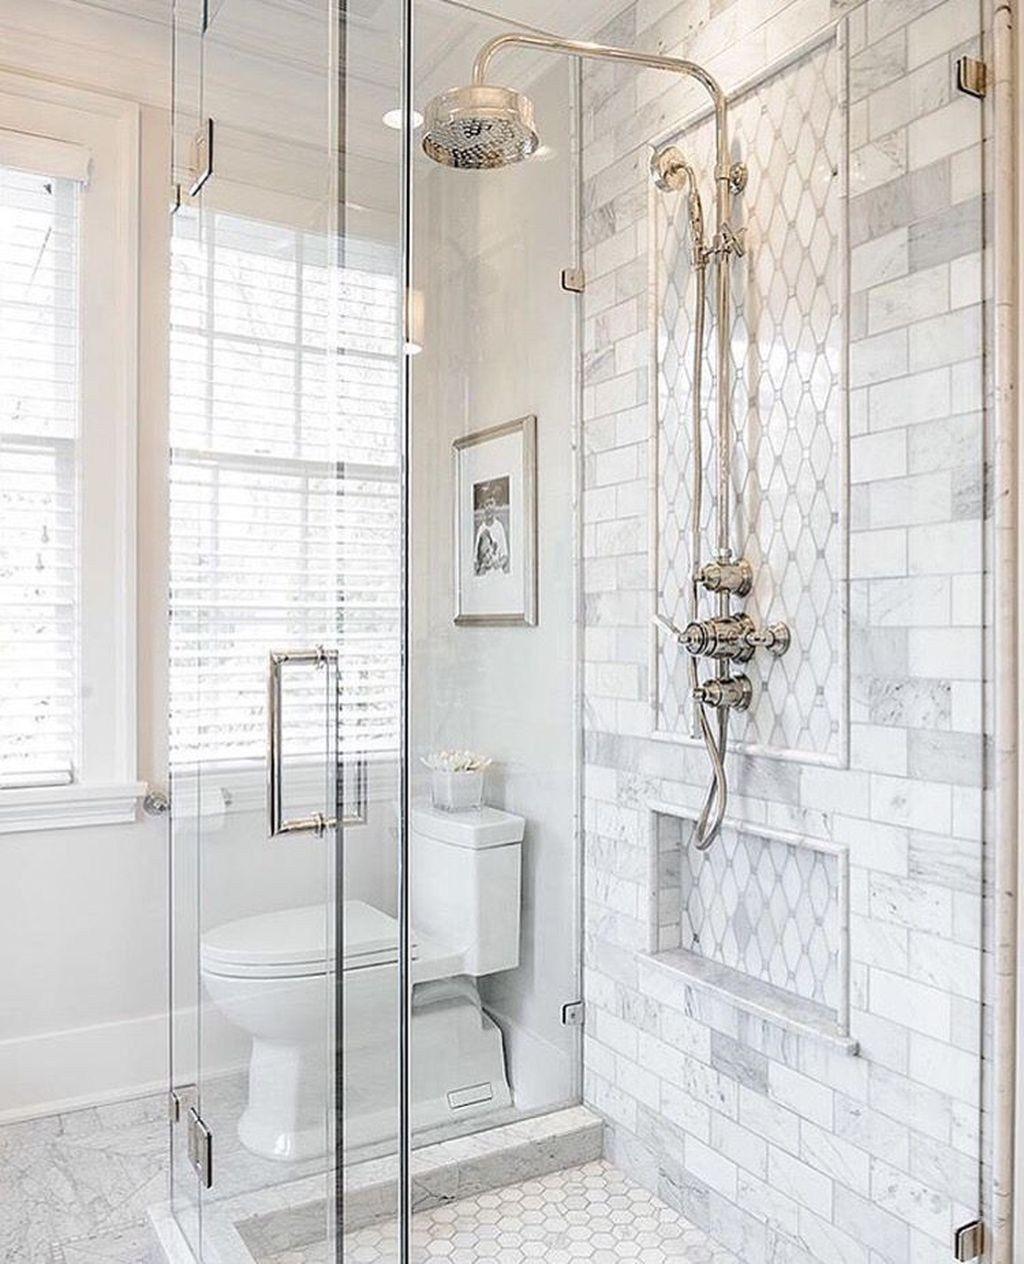 Best Small Master Bathroom Remodel Ideas 41 Bathroom Tile Designs Farmhouse Master Bathroom Small Master Bathroom